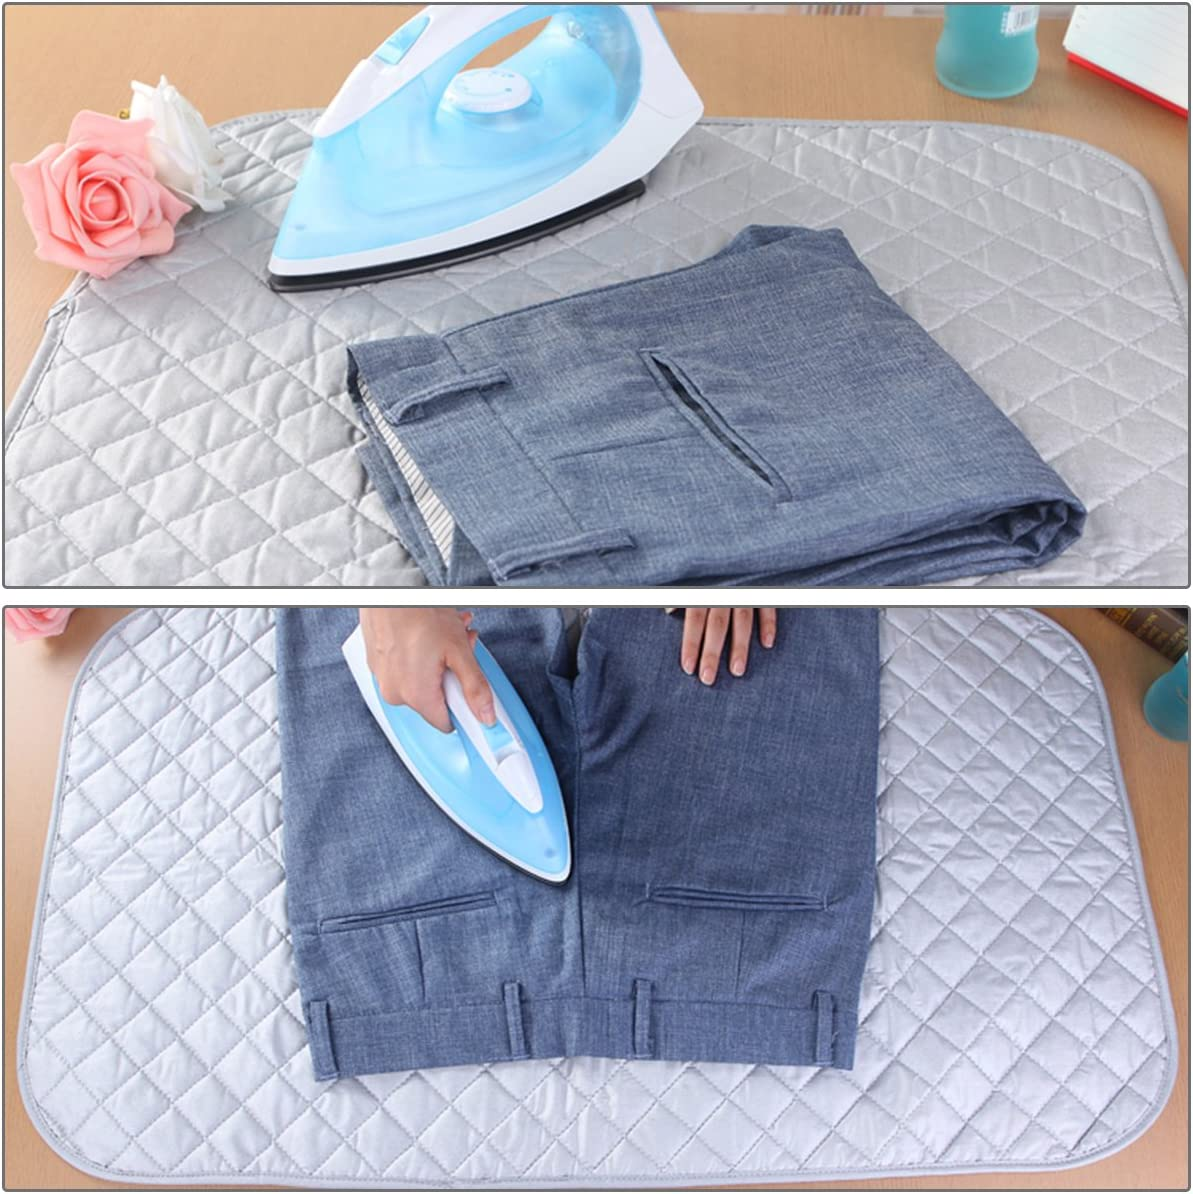 Kitchnexus Portable Ironing Blanket Heat Resistant Safe Iron Laundry Pad tappetino per Lavasciuga 48/x 85/cm//55/x 65/cm//70/x 100/cm 70*100cm Cotone